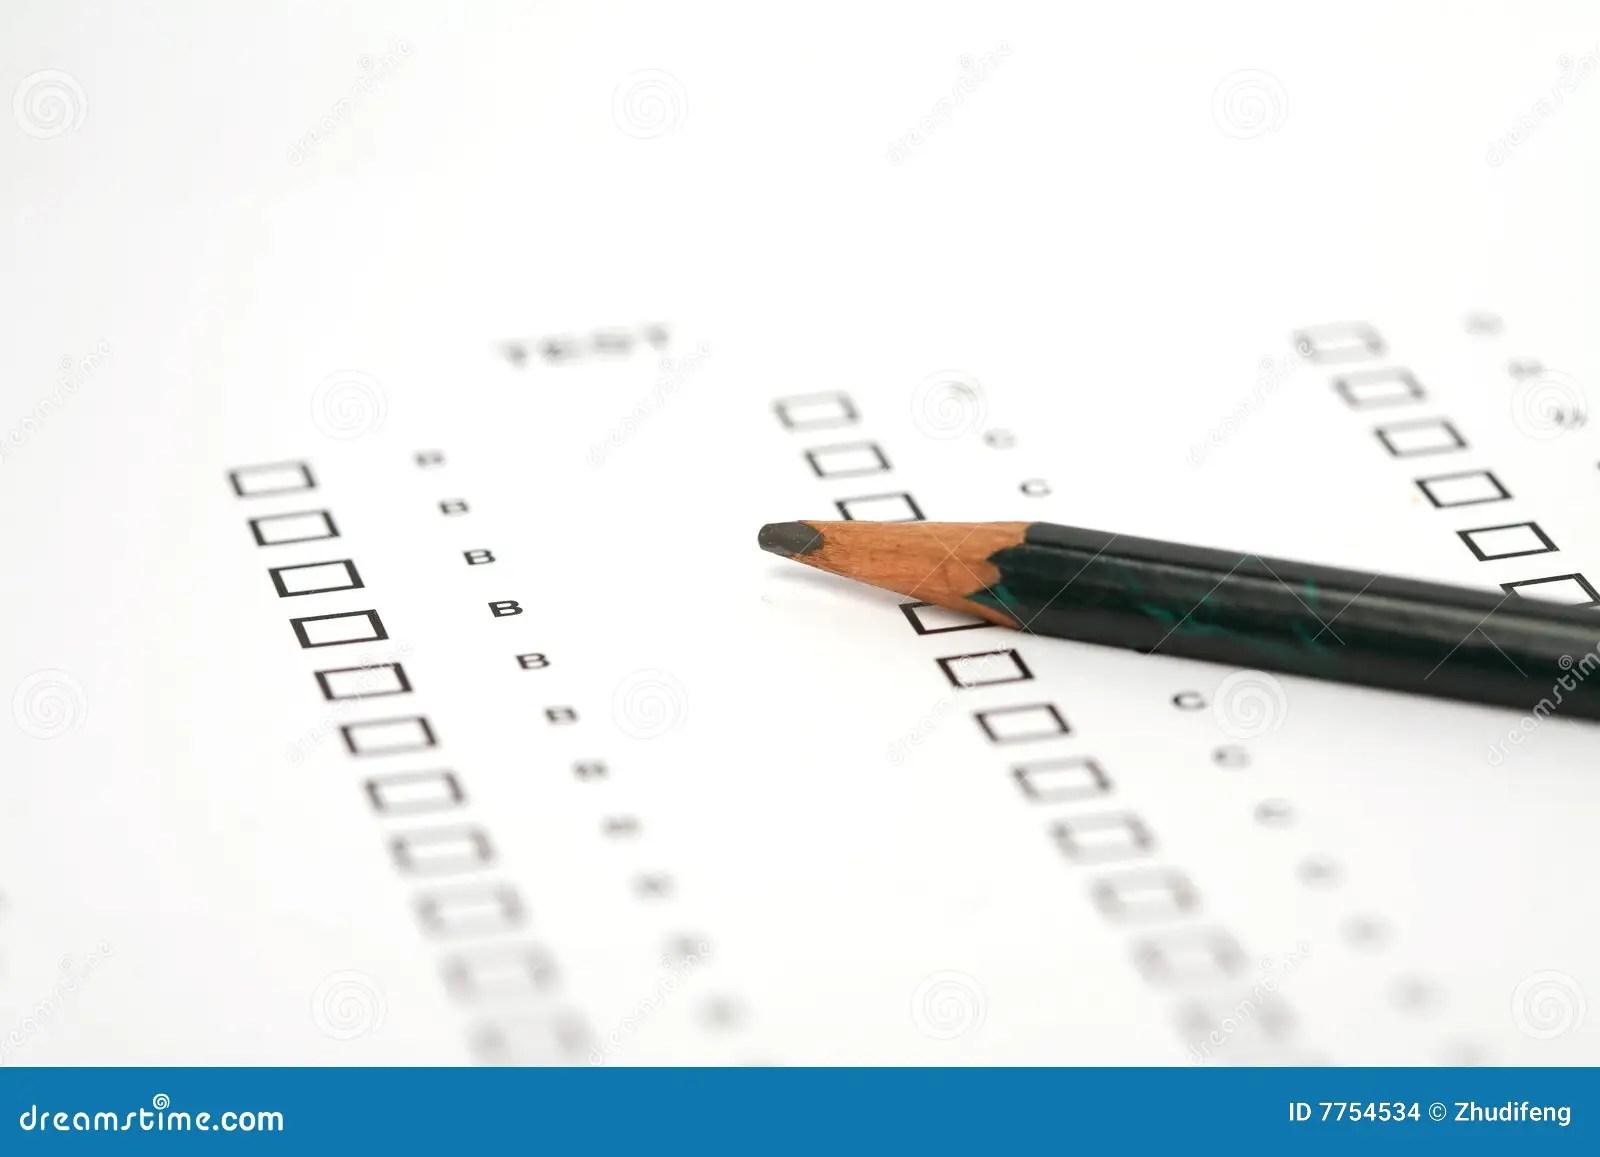 International Business: Test Paper For International Business